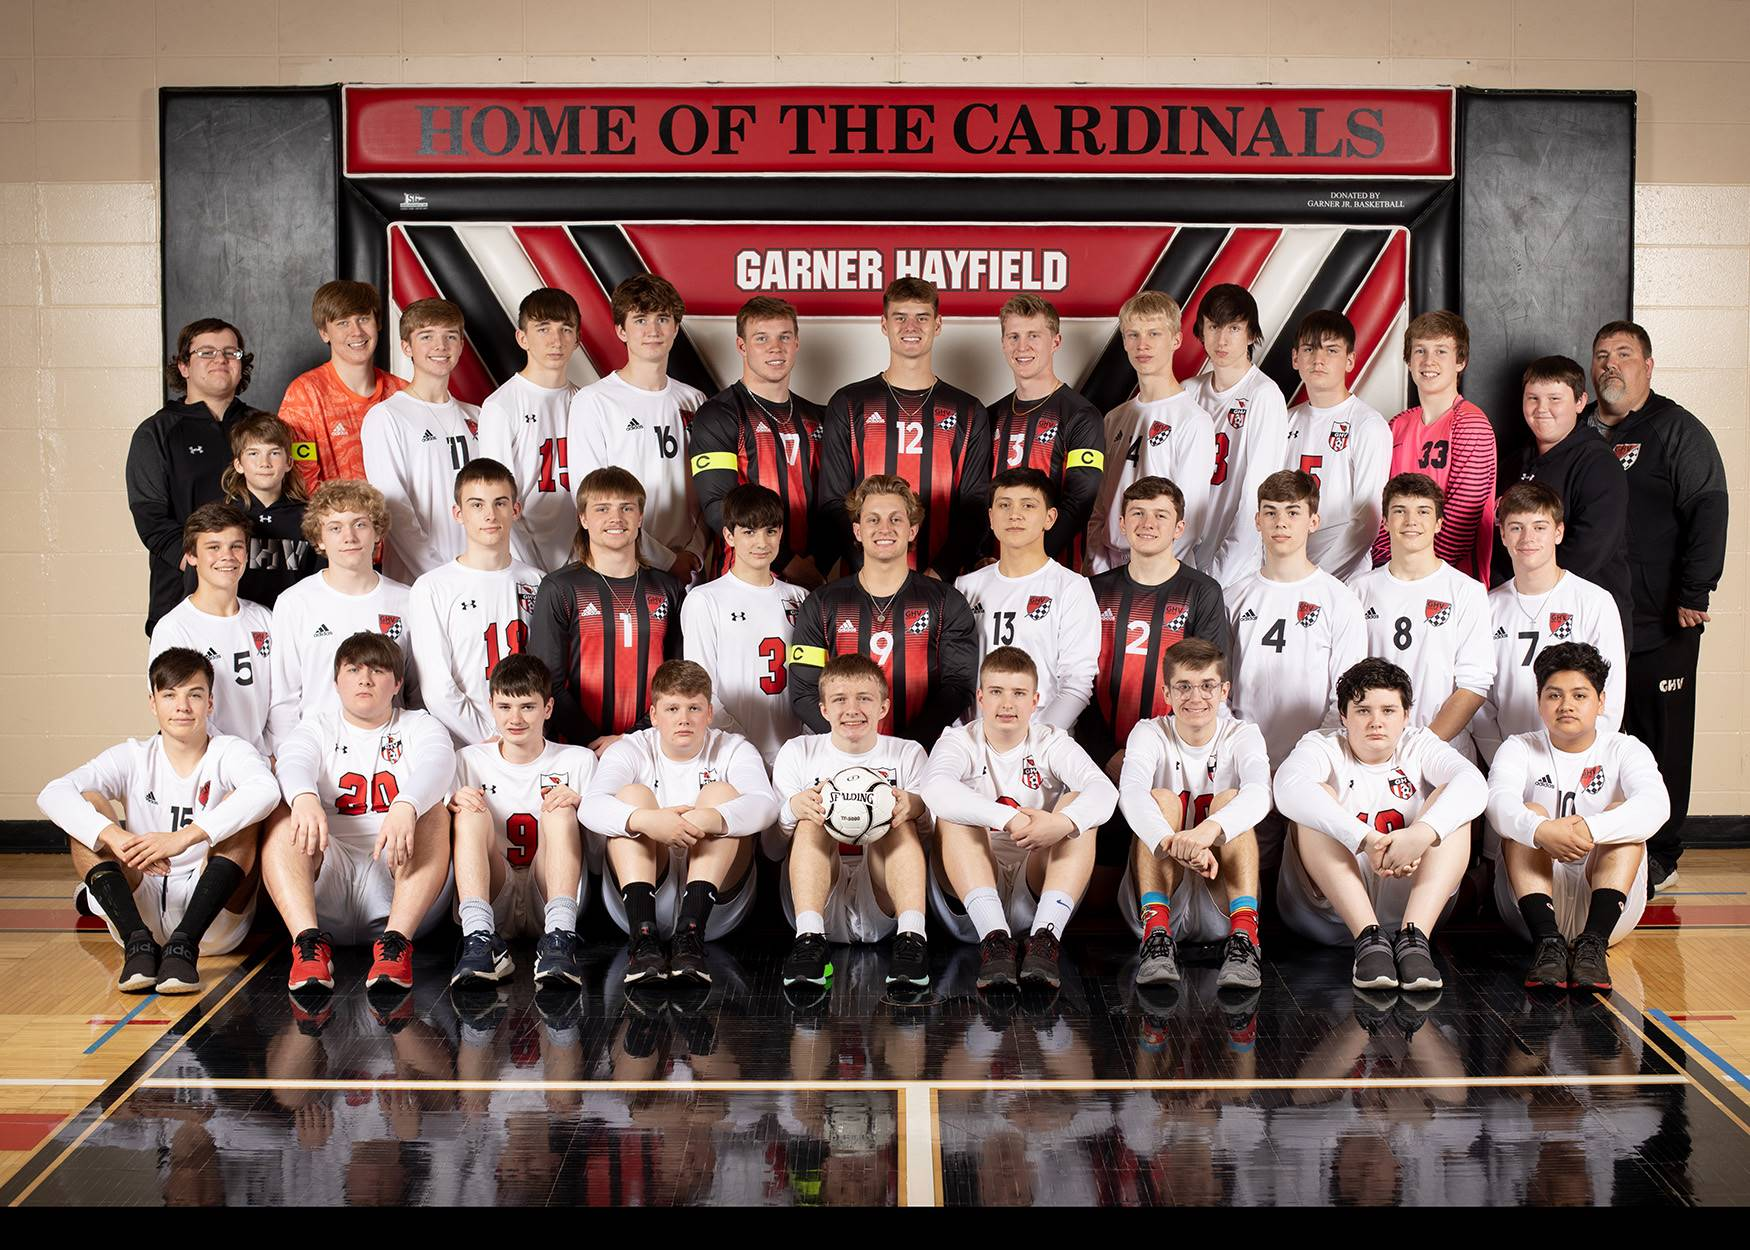 Boys soccer team posing for a photo